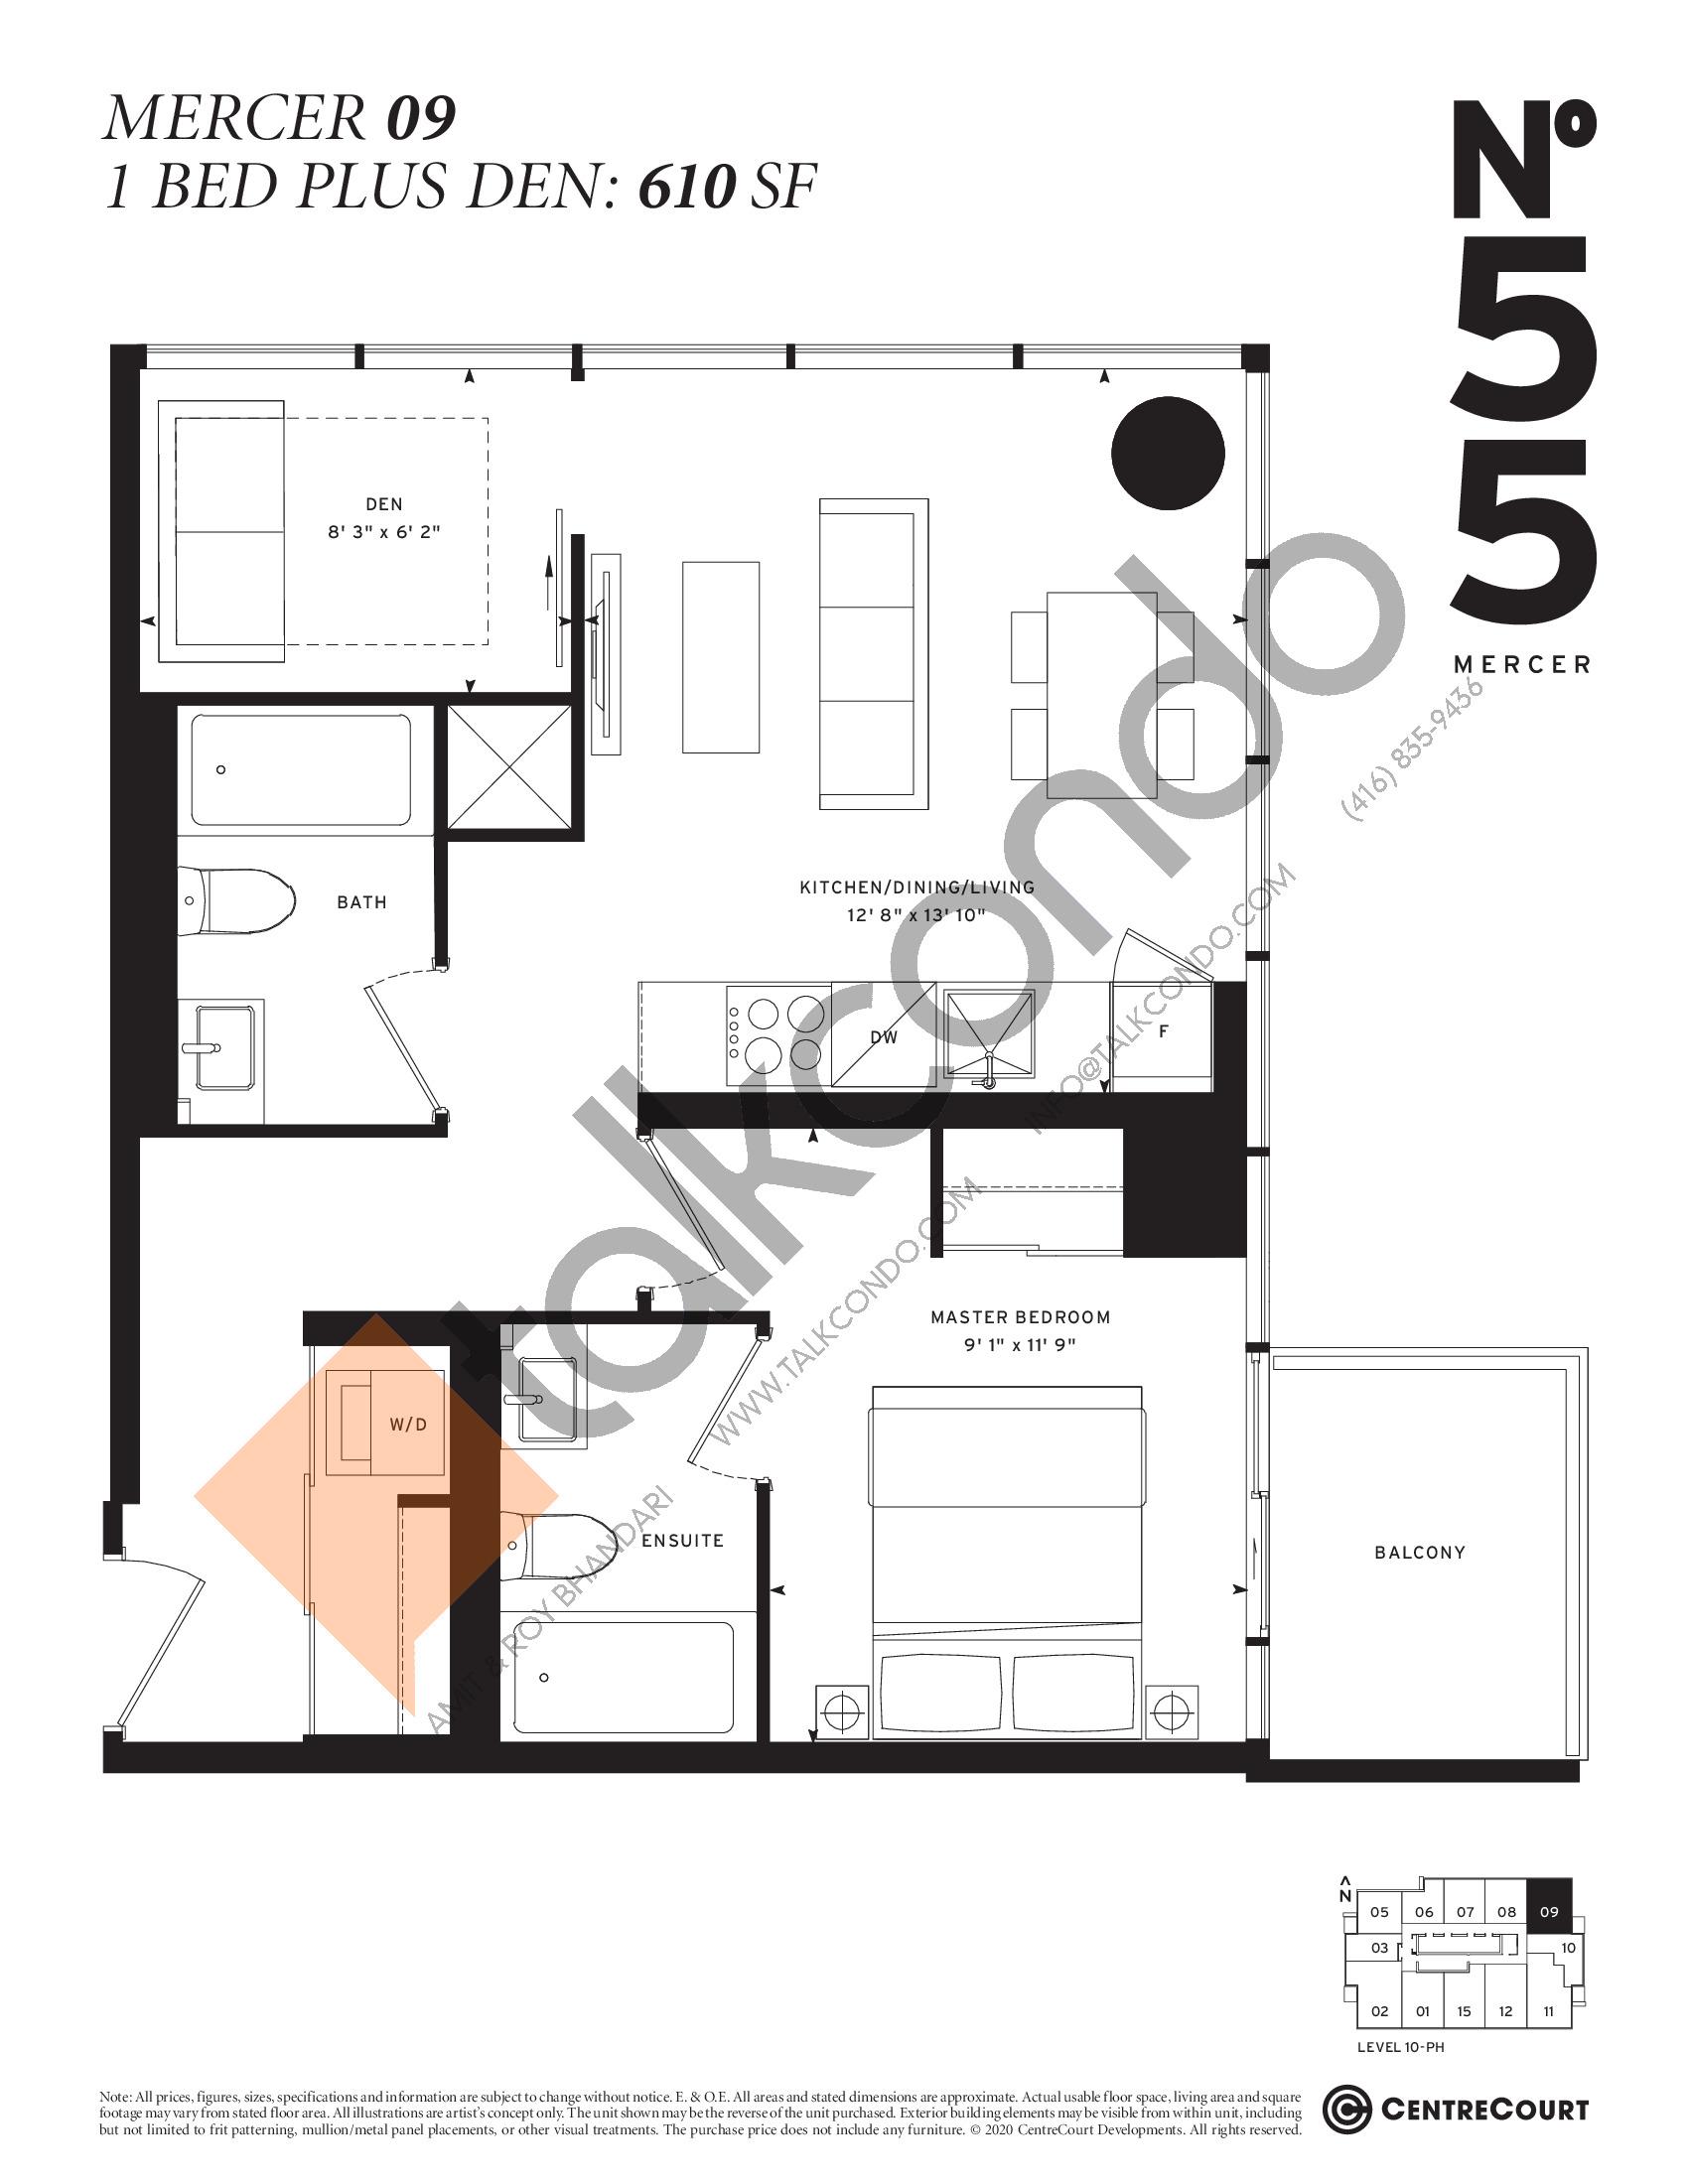 Mercer 09 Floor Plan at No. 55 Mercer Condos - 610 sq.ft